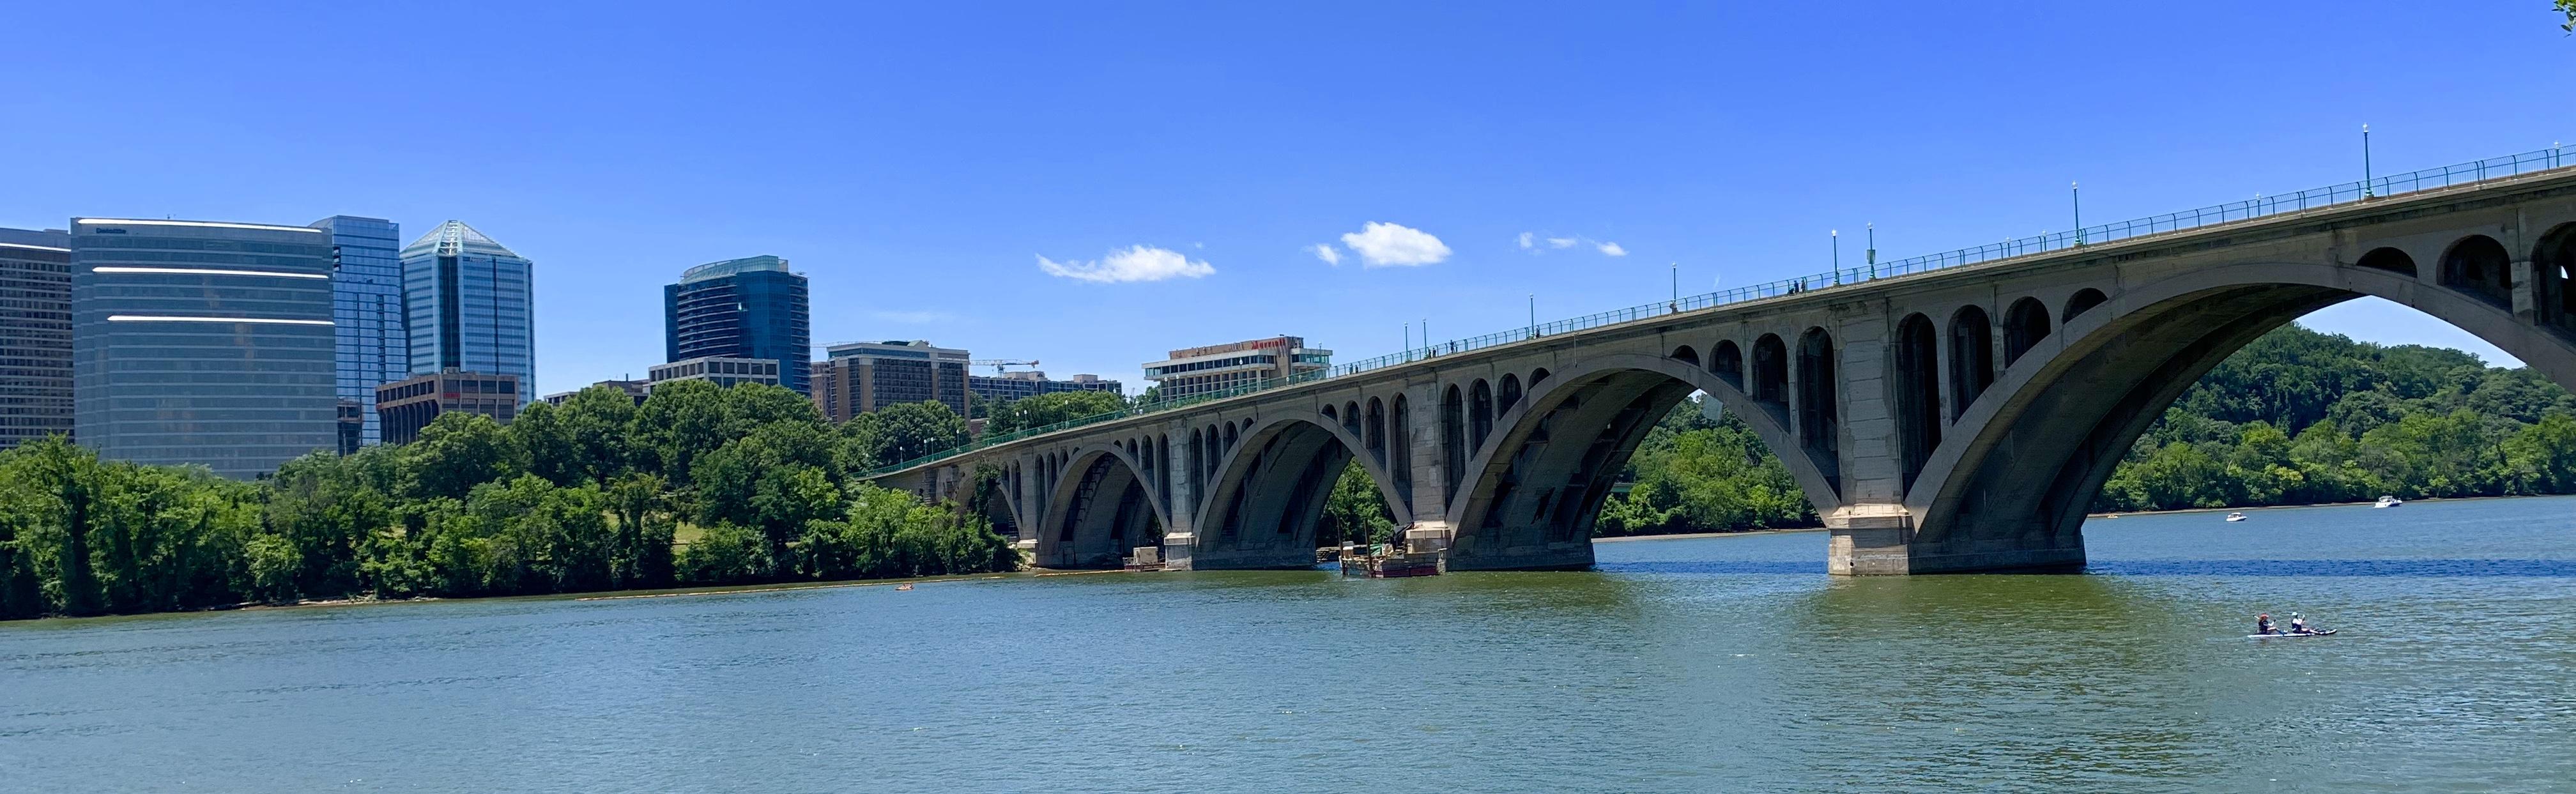 Francis Scott Key Bridge in Georgetown. Washington, DC Waterfront Homes